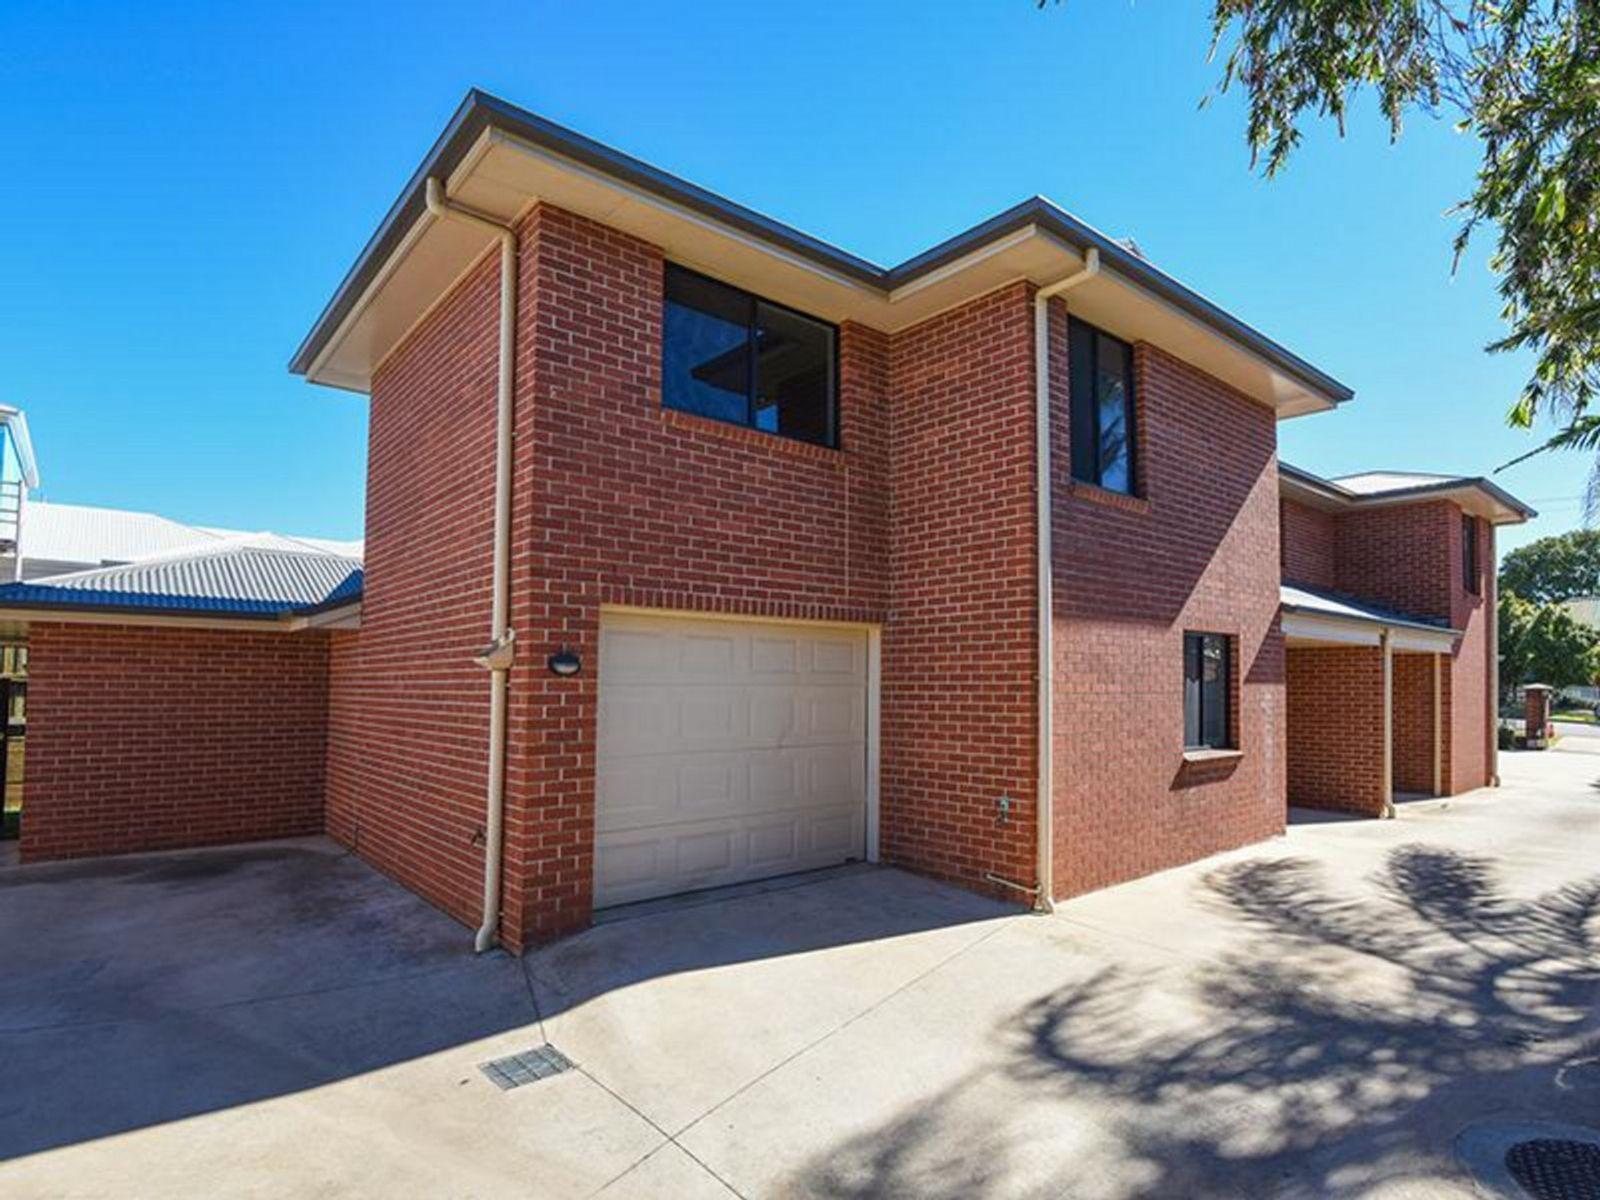 2/18 Gostwyck Street, Newtown, QLD 4350